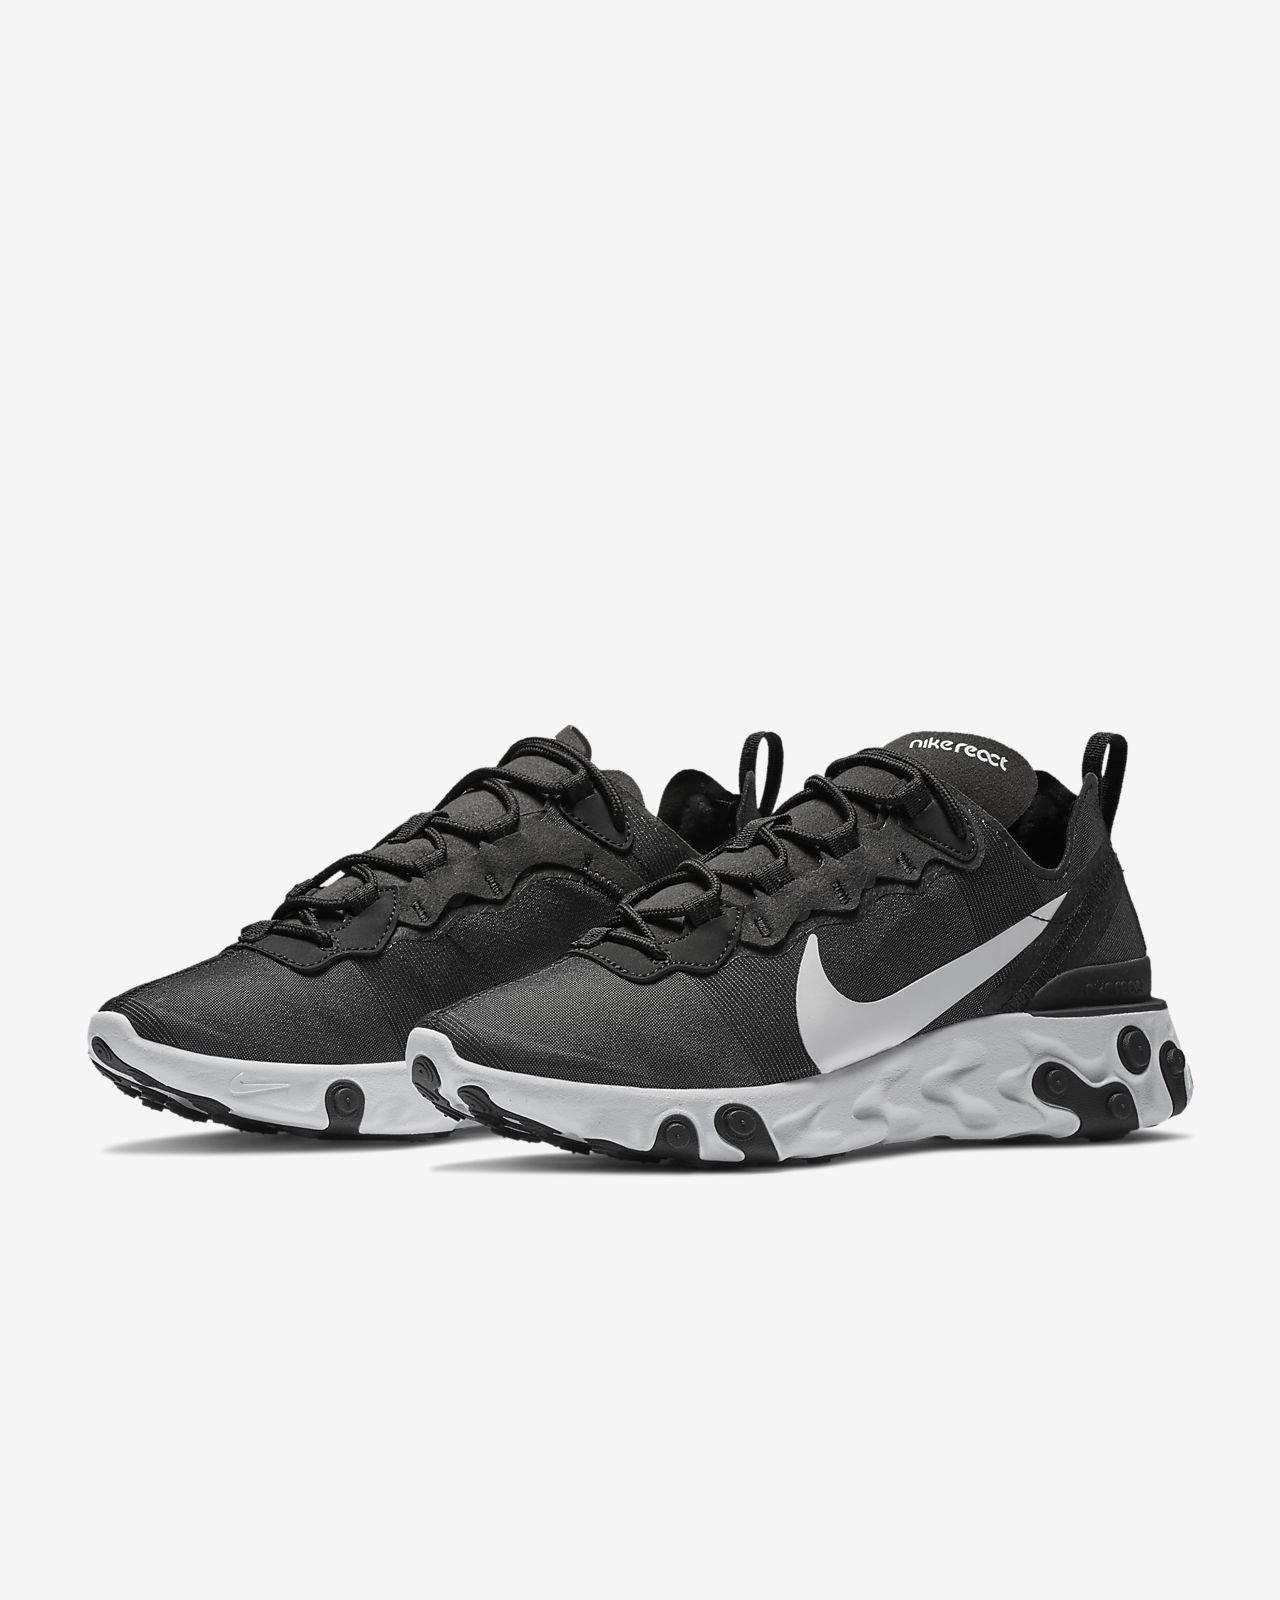 1378029b557 Low Resolution Dámská bota Nike React Element 55 Dámská bota Nike React  Element 55